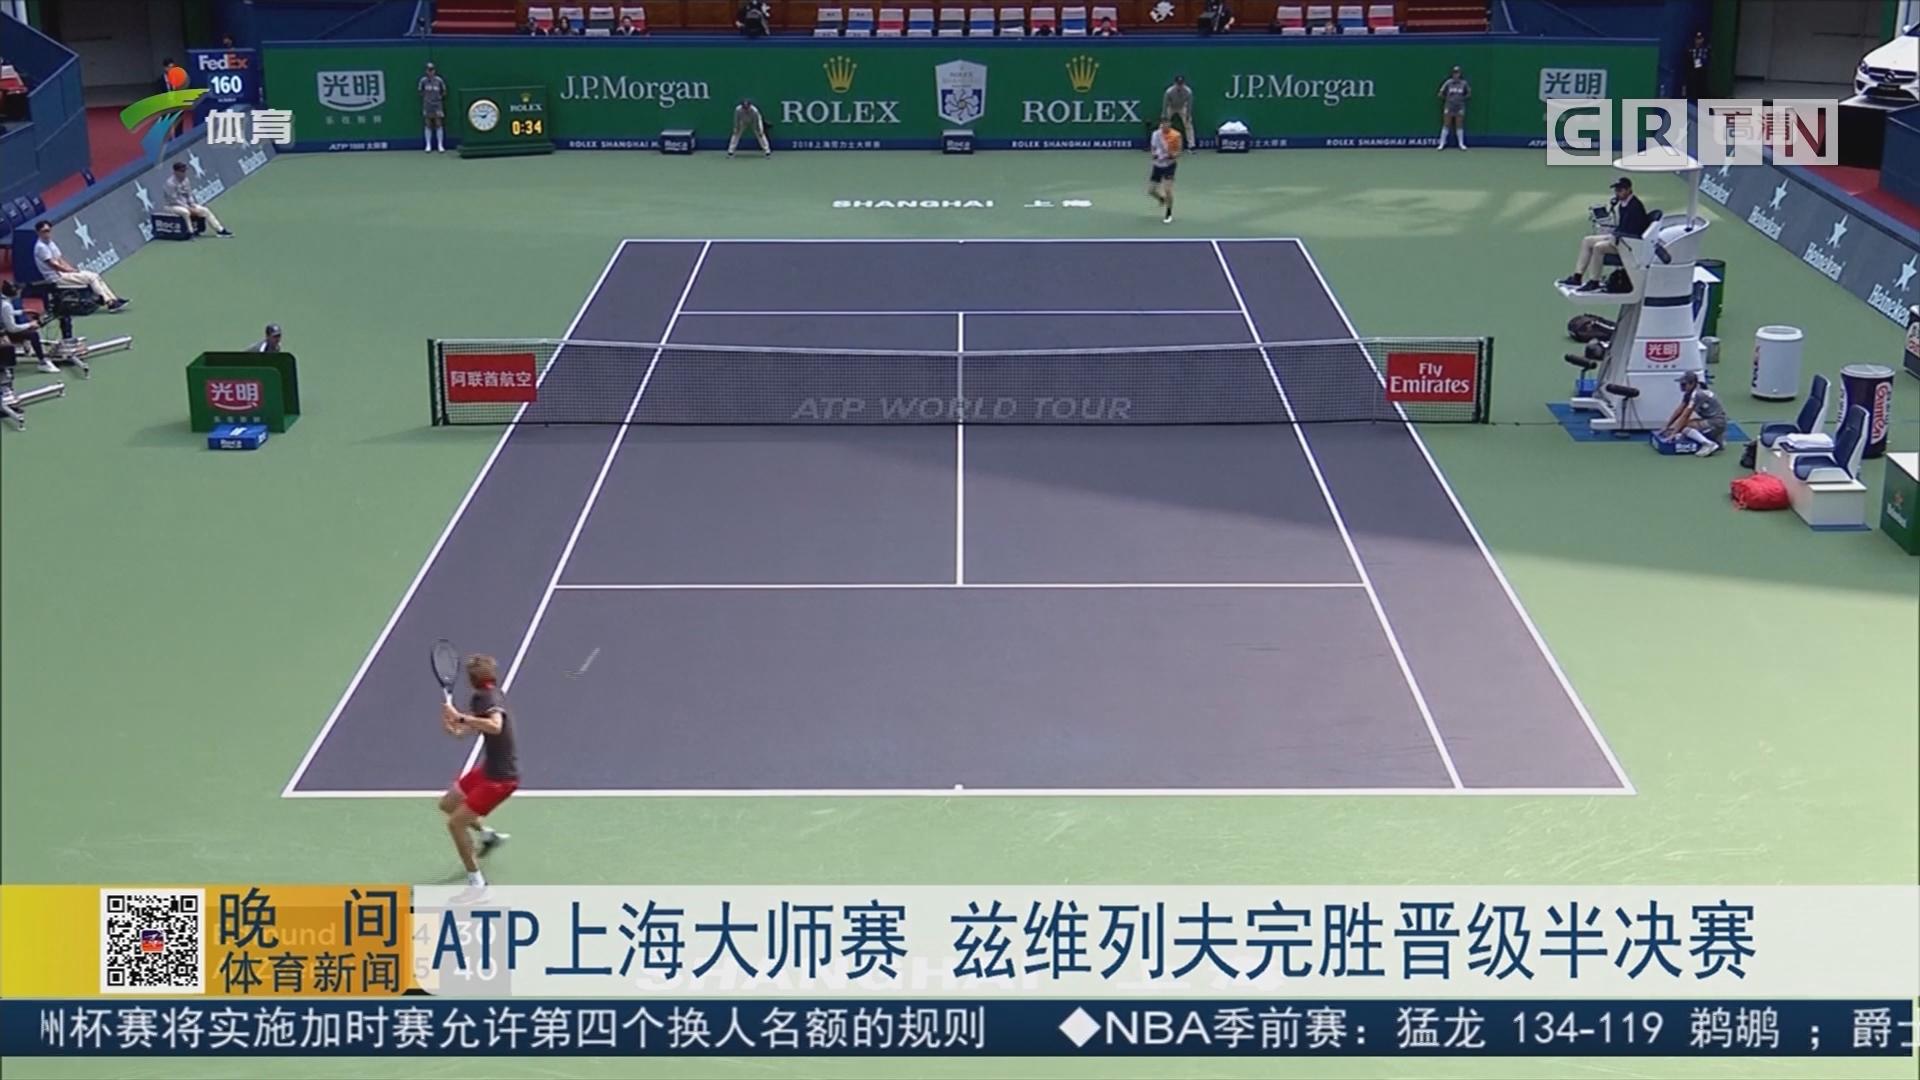 ATP上海大师赛 兹维列夫完胜晋级半决赛